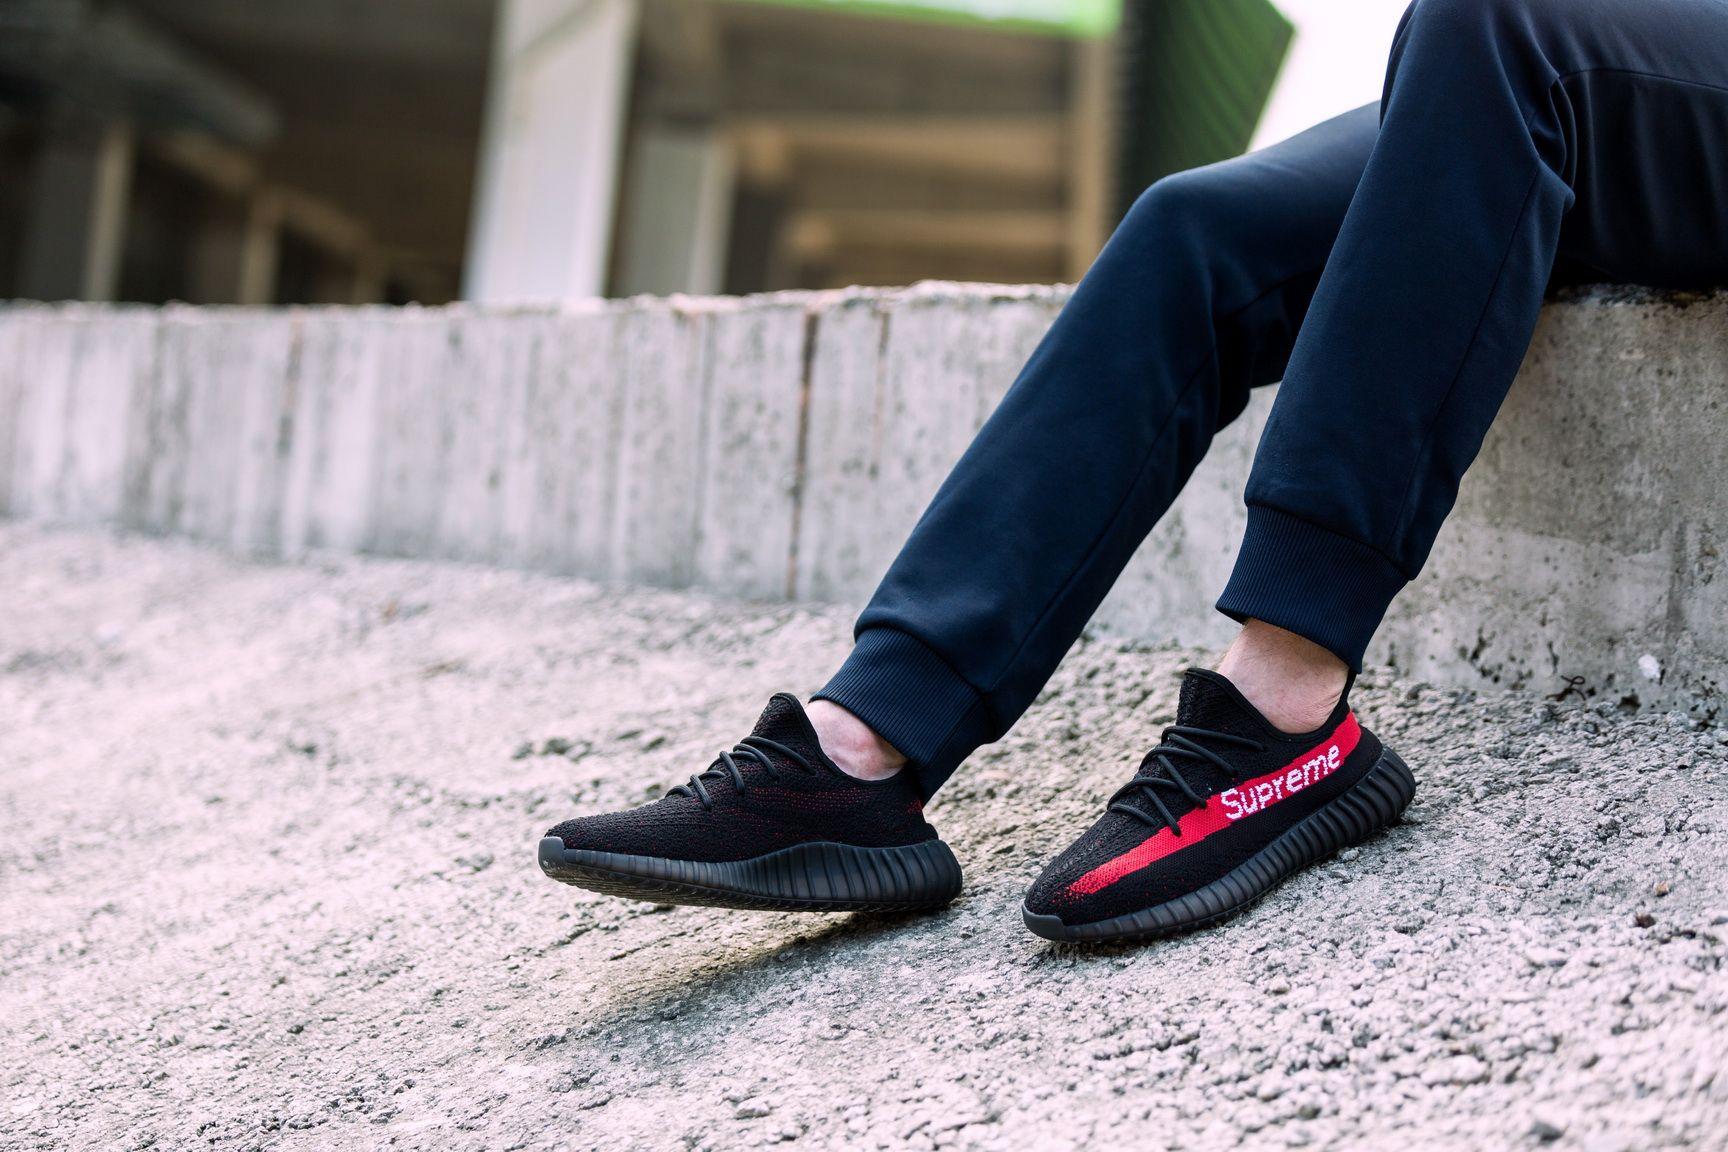 9559f9087 Supreme x Adidas Yeezy Boost 350V2 Black Real Boost 6